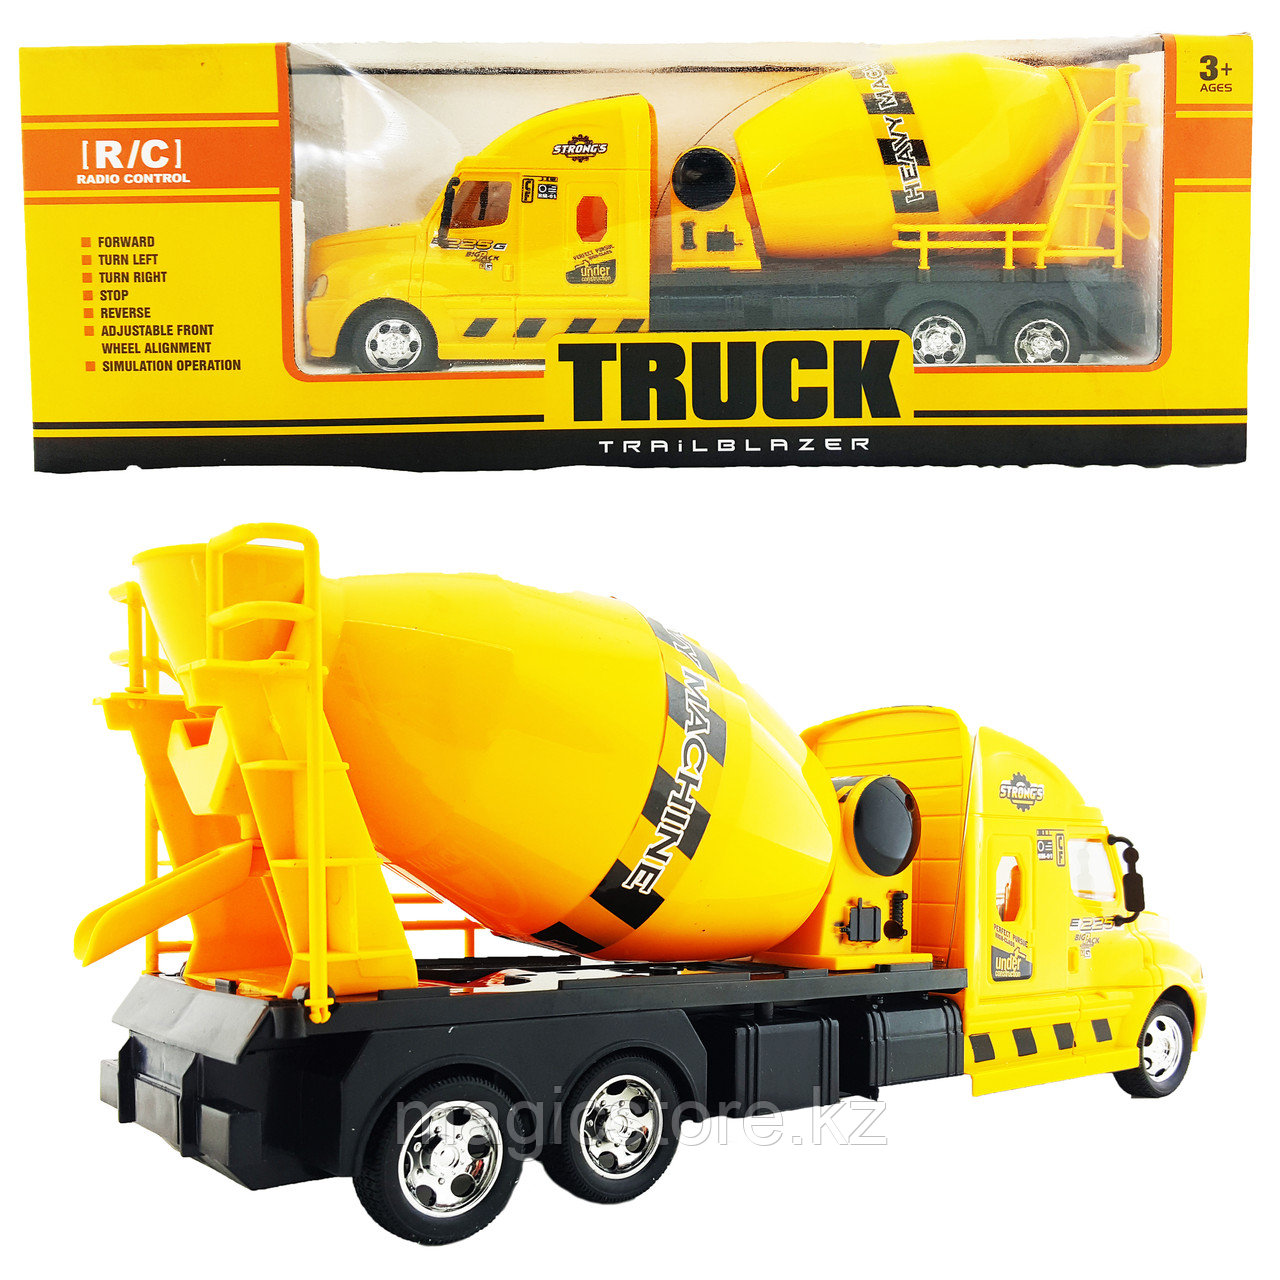 Truck Trailblazer R/C Trough Tipper Спецтехника Радиоуправляемая Бетономешалка, звук и свет - фото 3